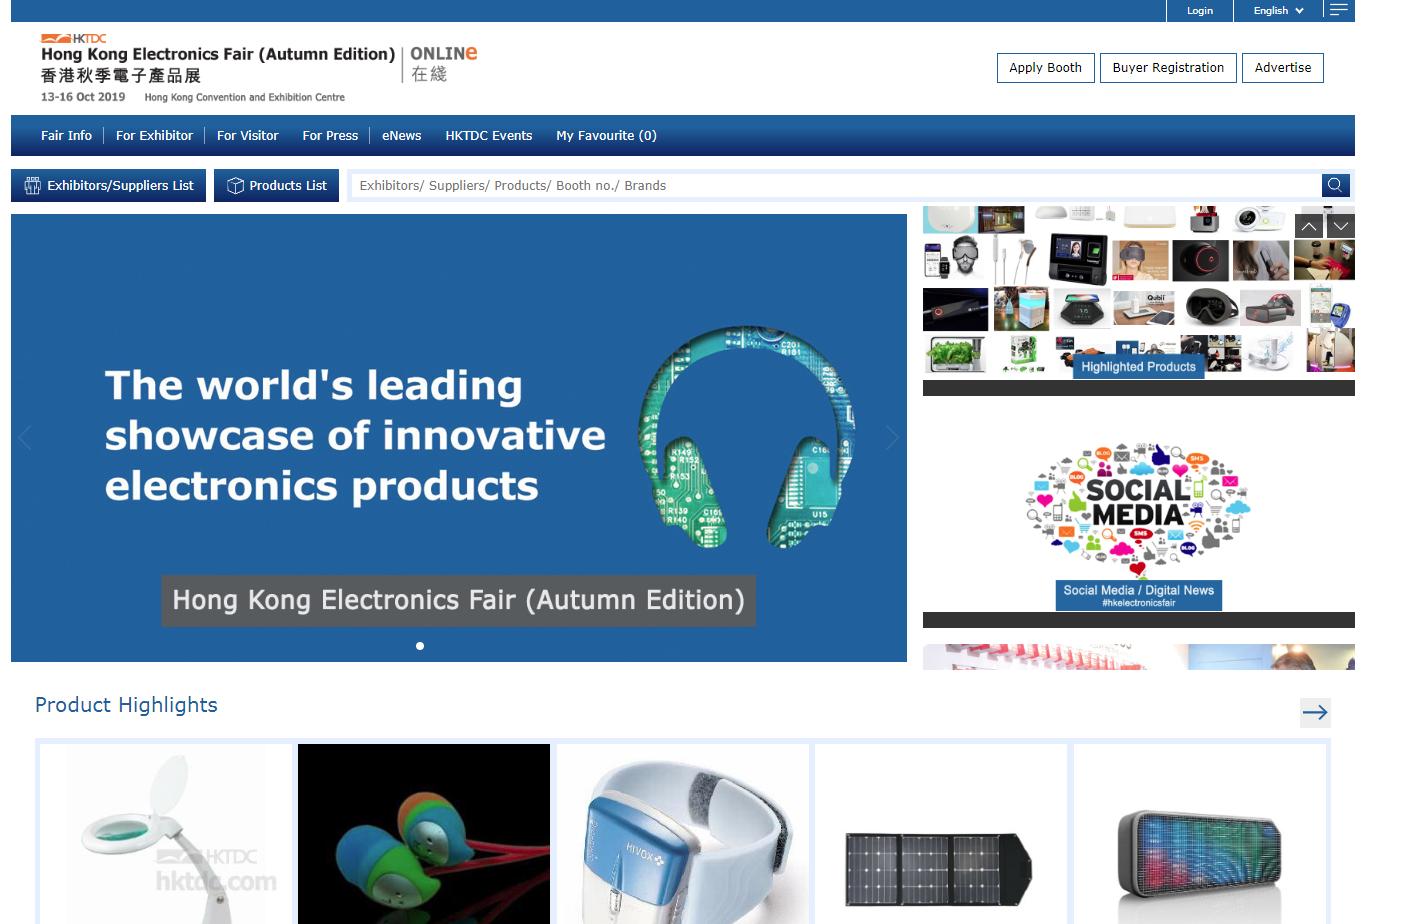 image of Hong Kong Trade Development Council Wins 2019 Best Electronics Mobile Website Mobile WebAward for HKTDC Hong Kong Electronics Fair (Autumn Edition) Online